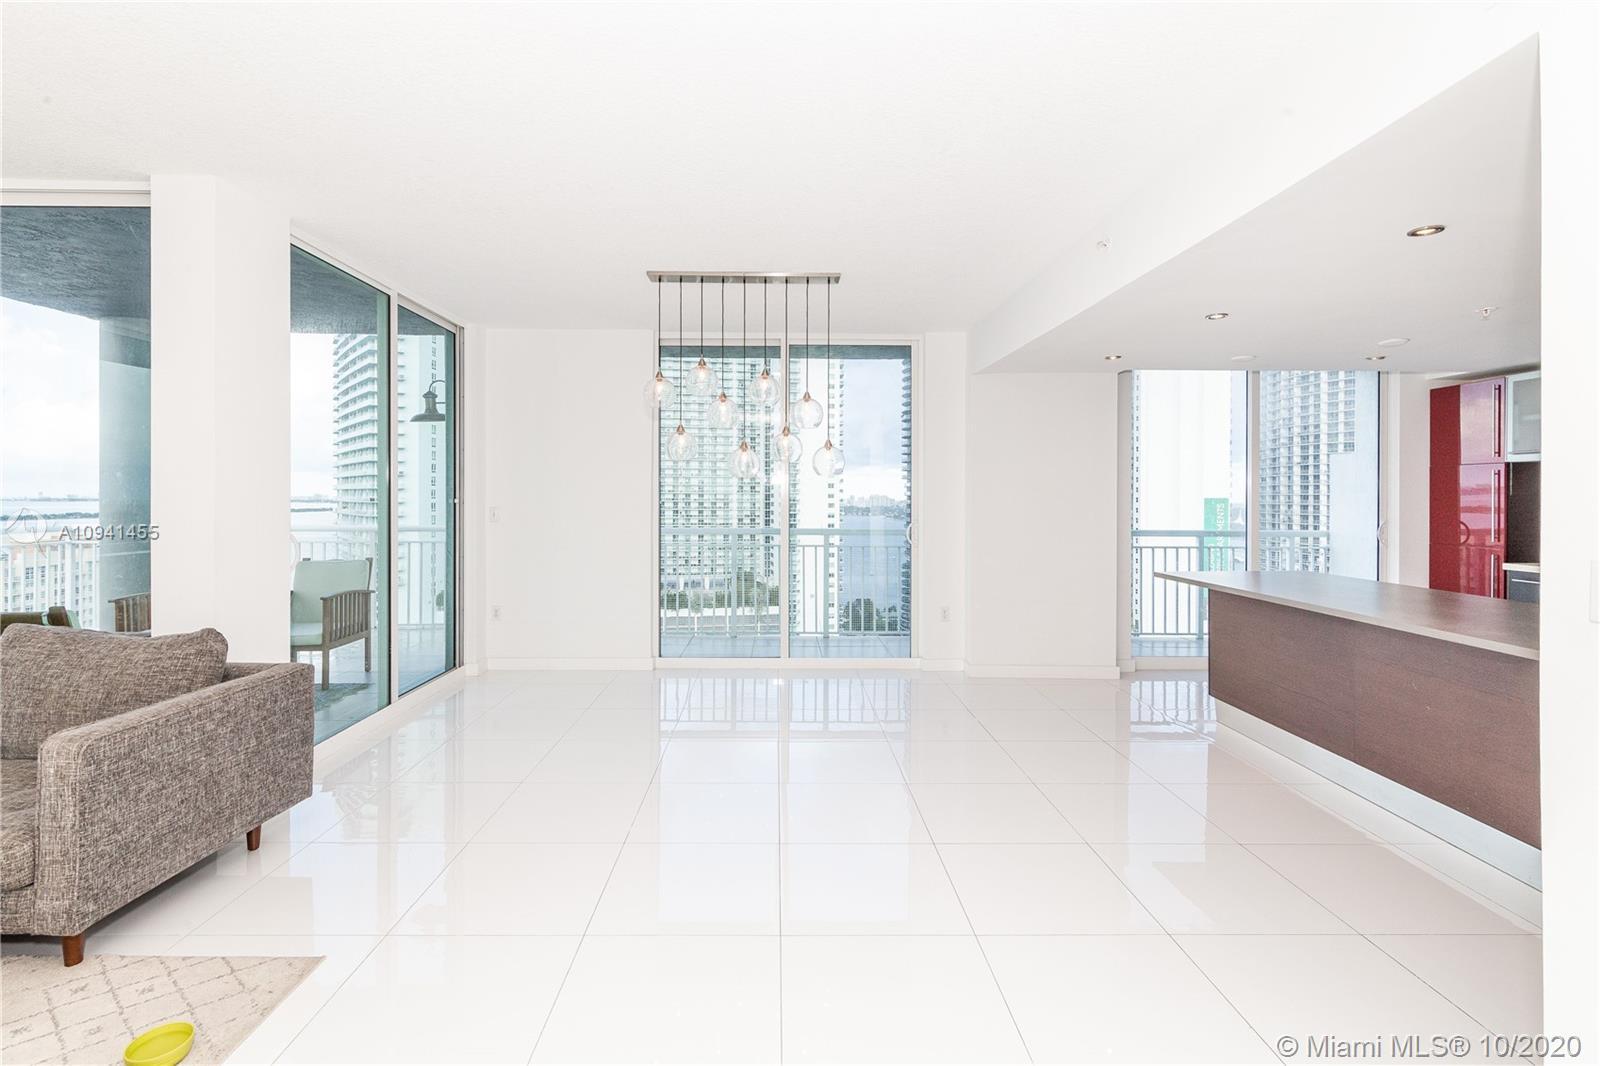 1800 Biscayne Plaza #PH-08 - 275 NE 18th St #PH-08, Miami, FL 33132